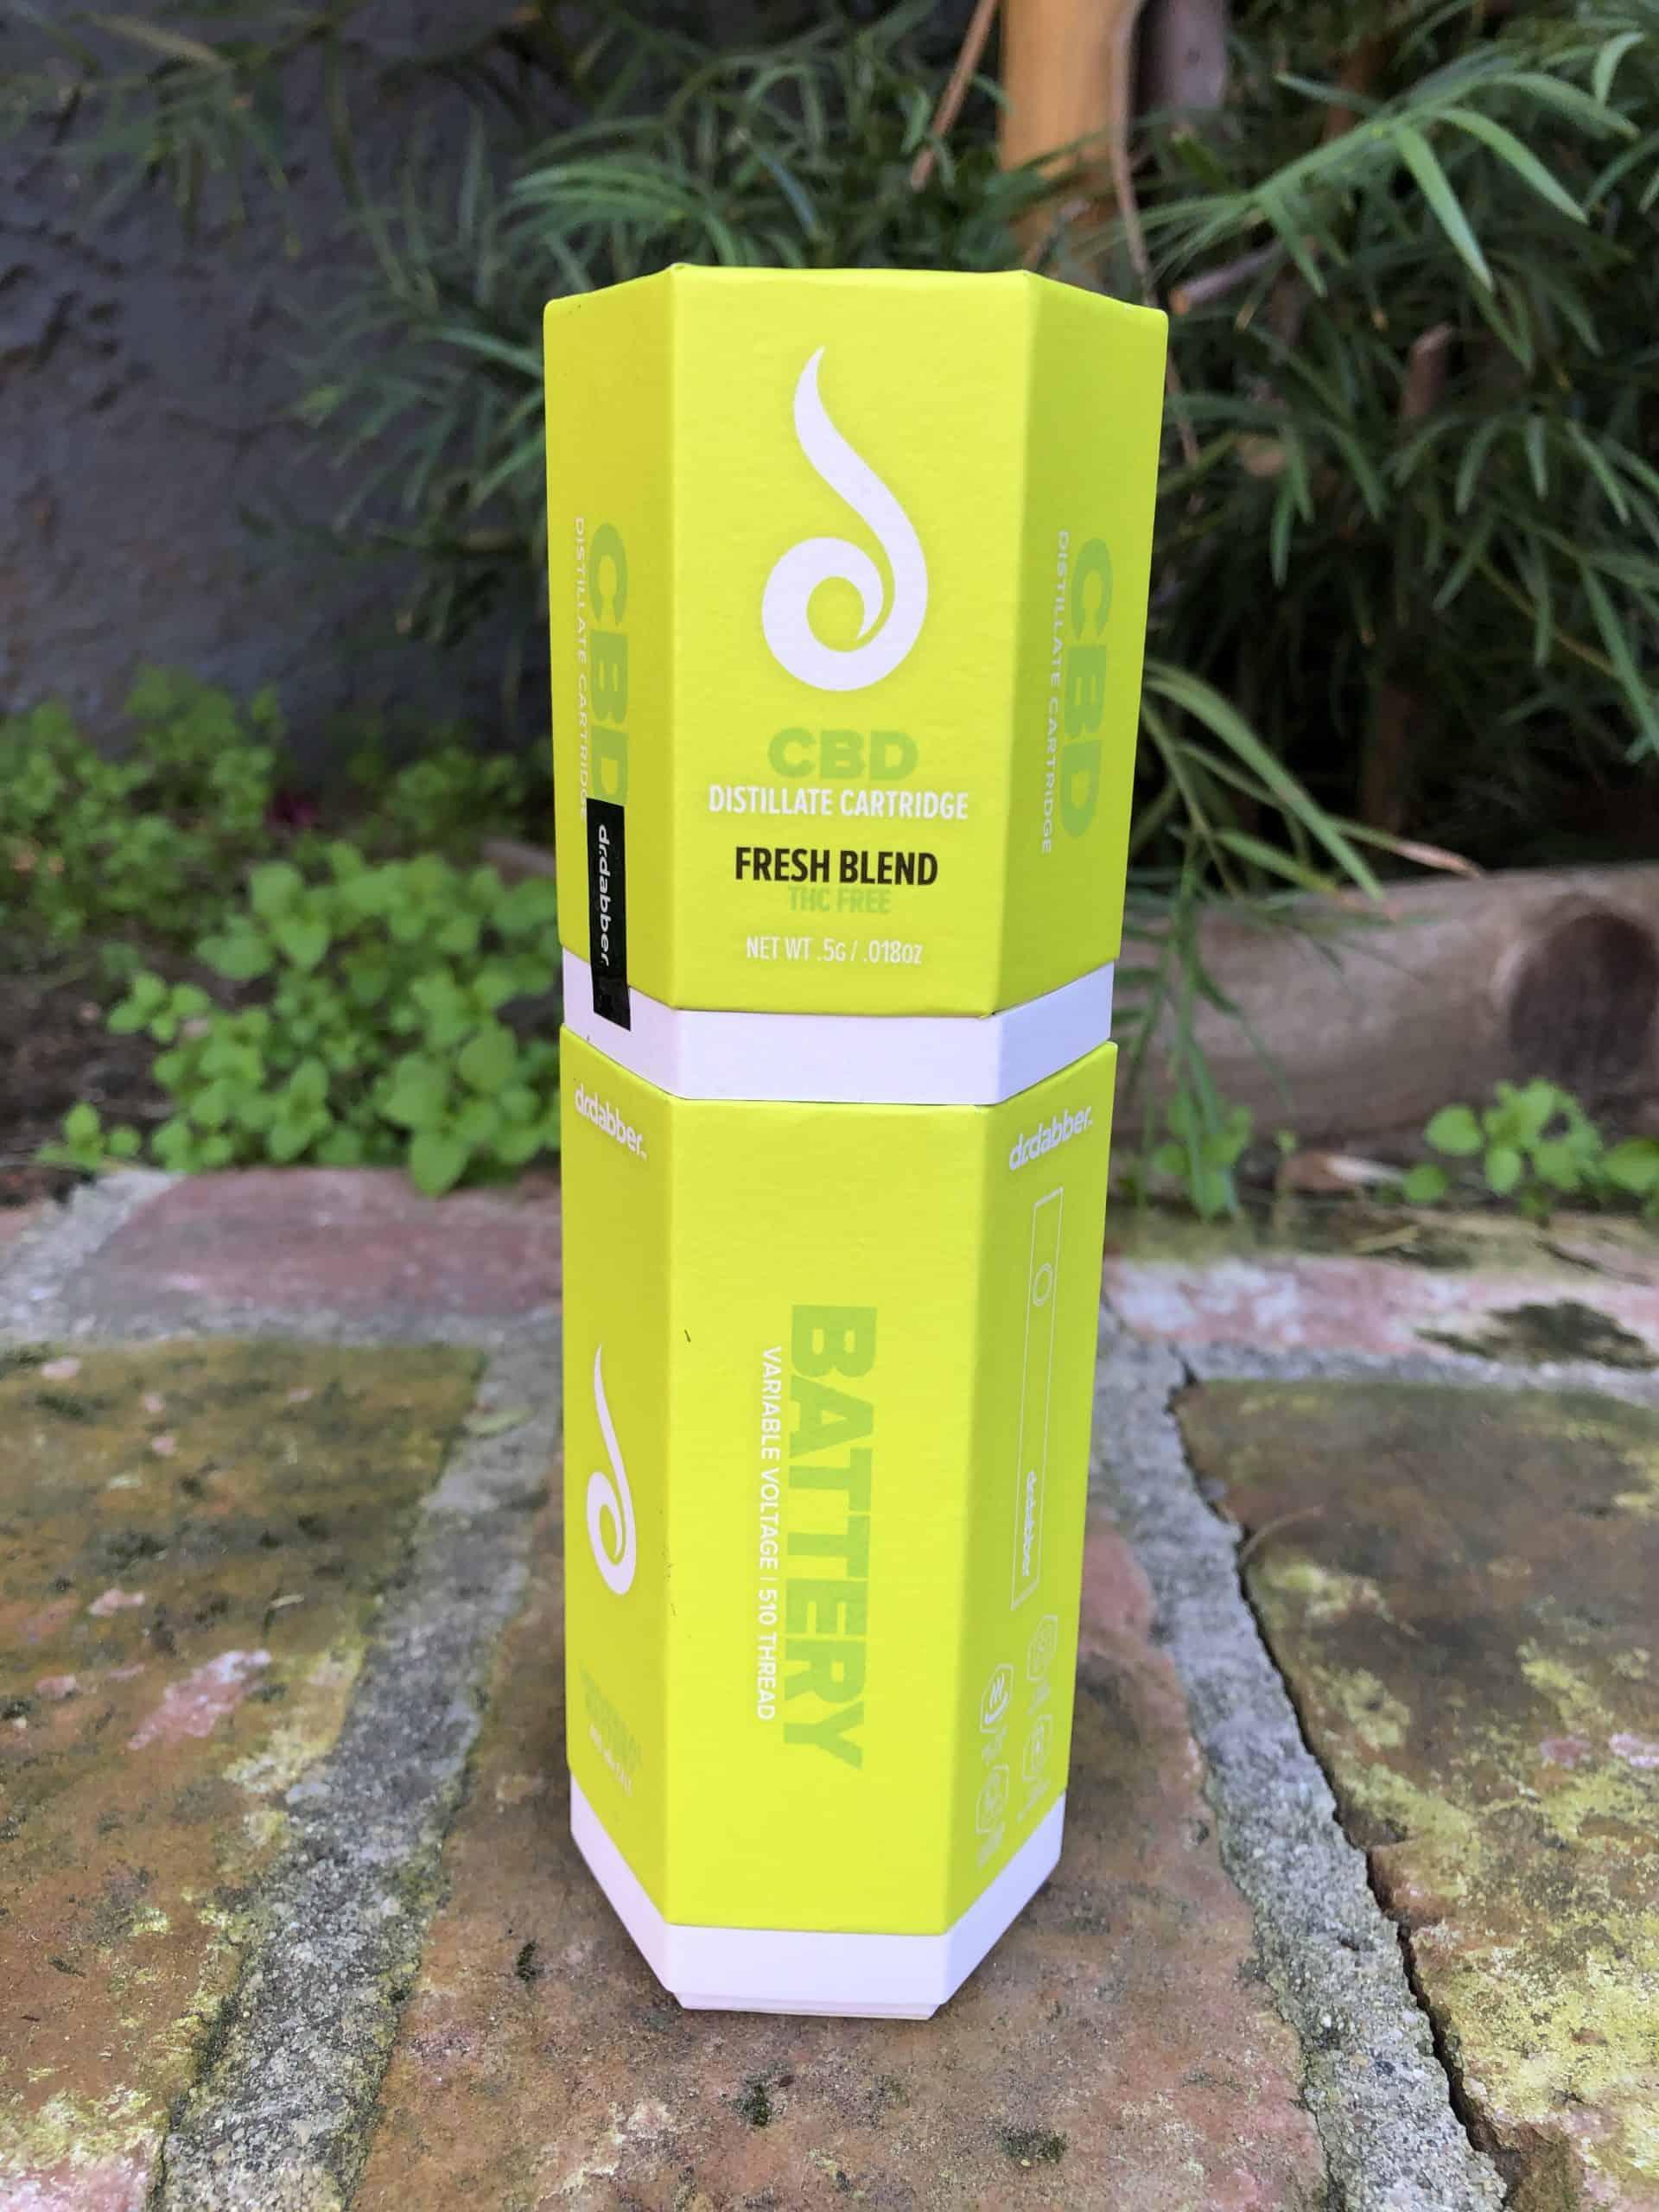 Dr. Dabber CBD Cartridge & Battery Combo - Fresh Blend